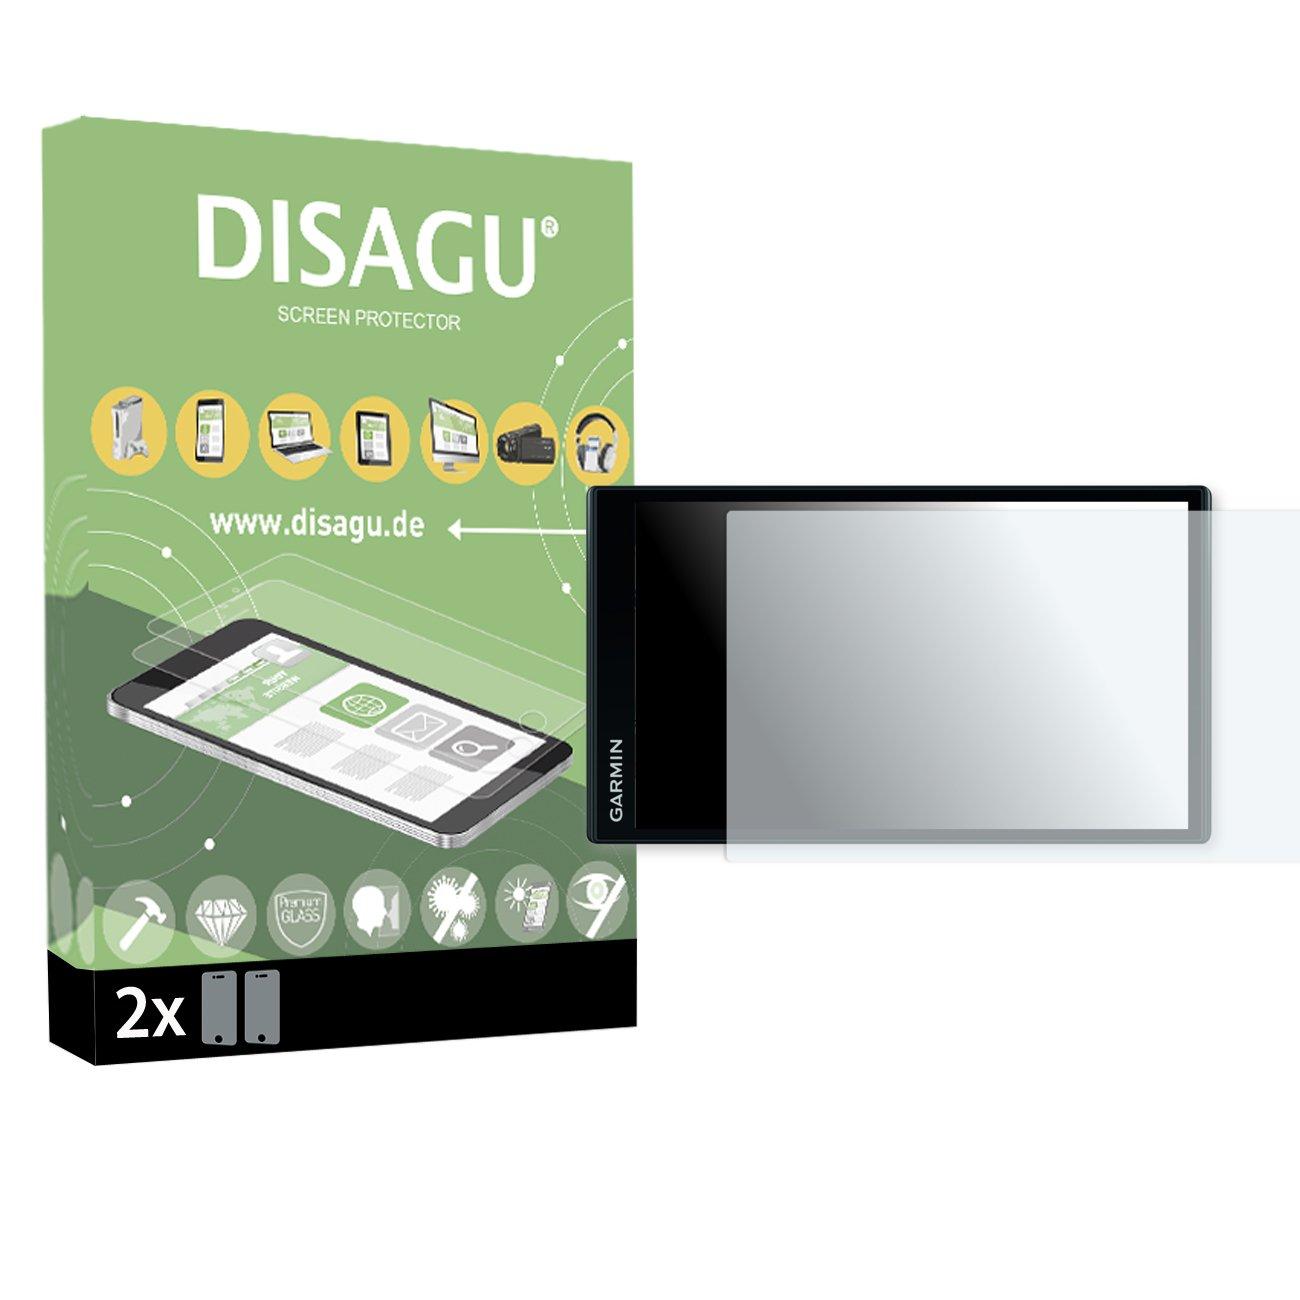 2X DISAGU Flexible Tempered Glass for Garmin DriveSmart 61 LMT Armor Glass 9H Hard Glass Screen Protective Film 3D Compatible #tg7800_2